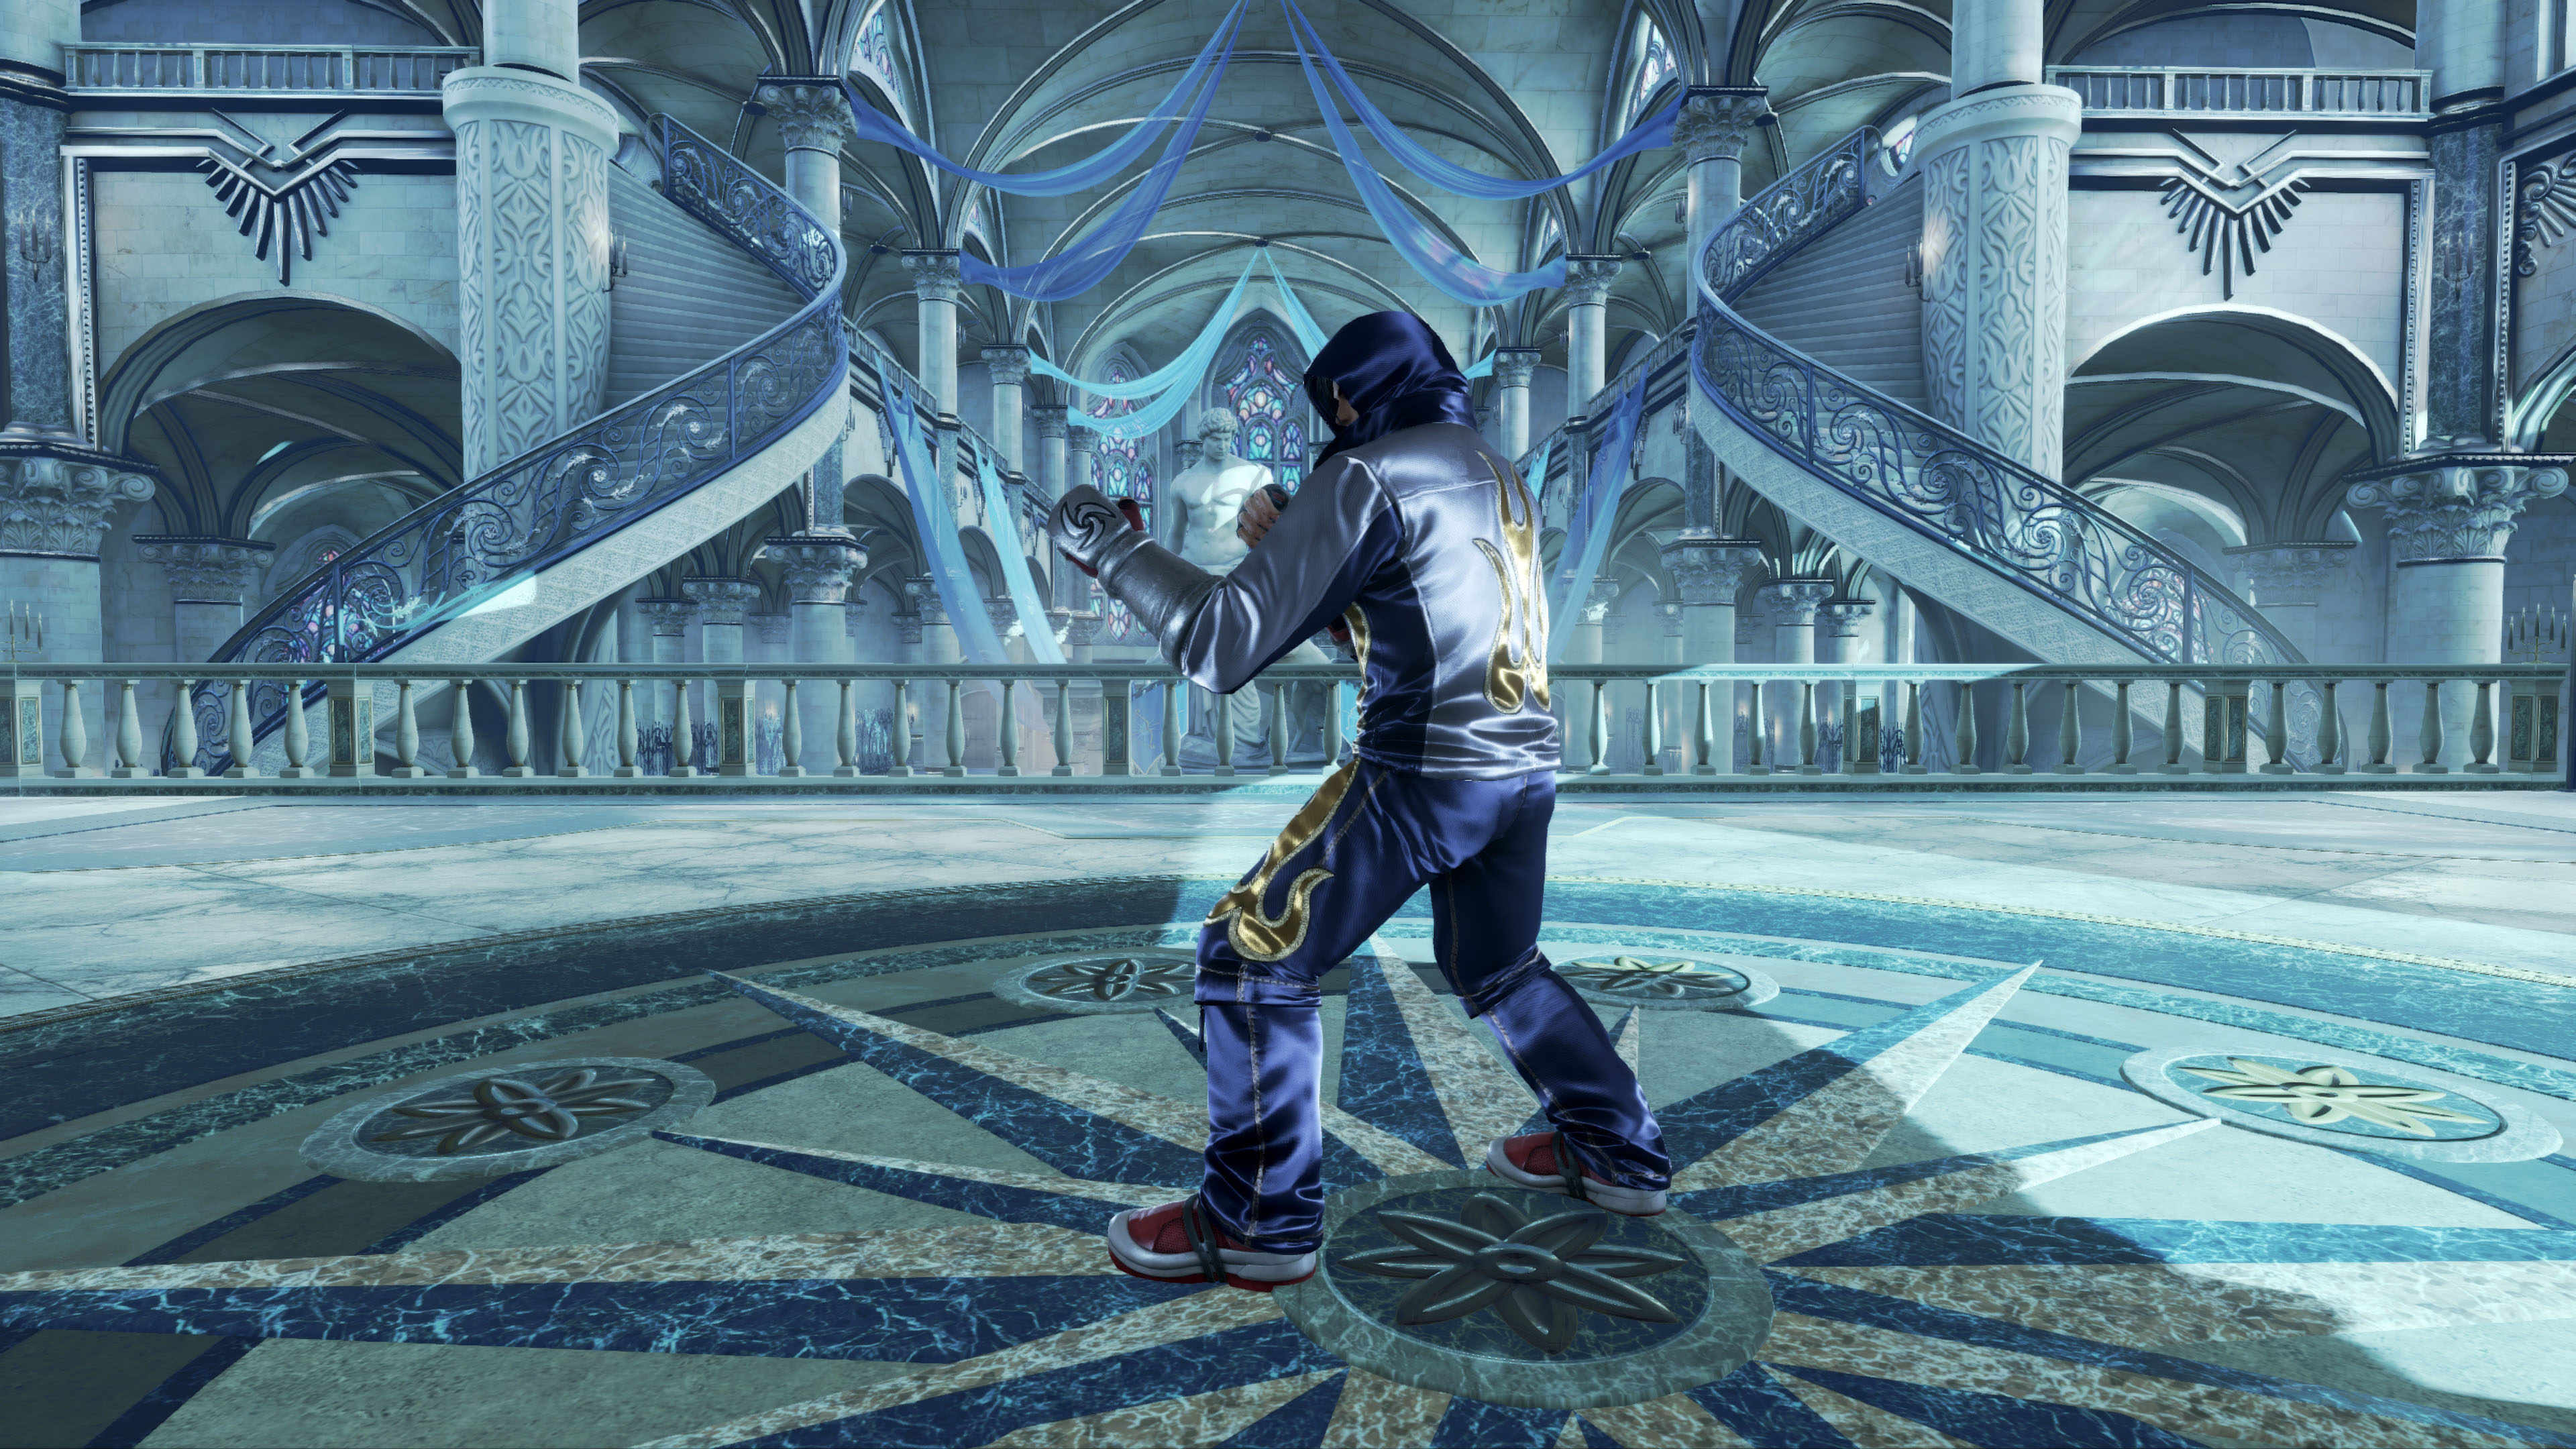 Tekken 7 Pc Jin S Tekken 4 Costume Mod Now Available News